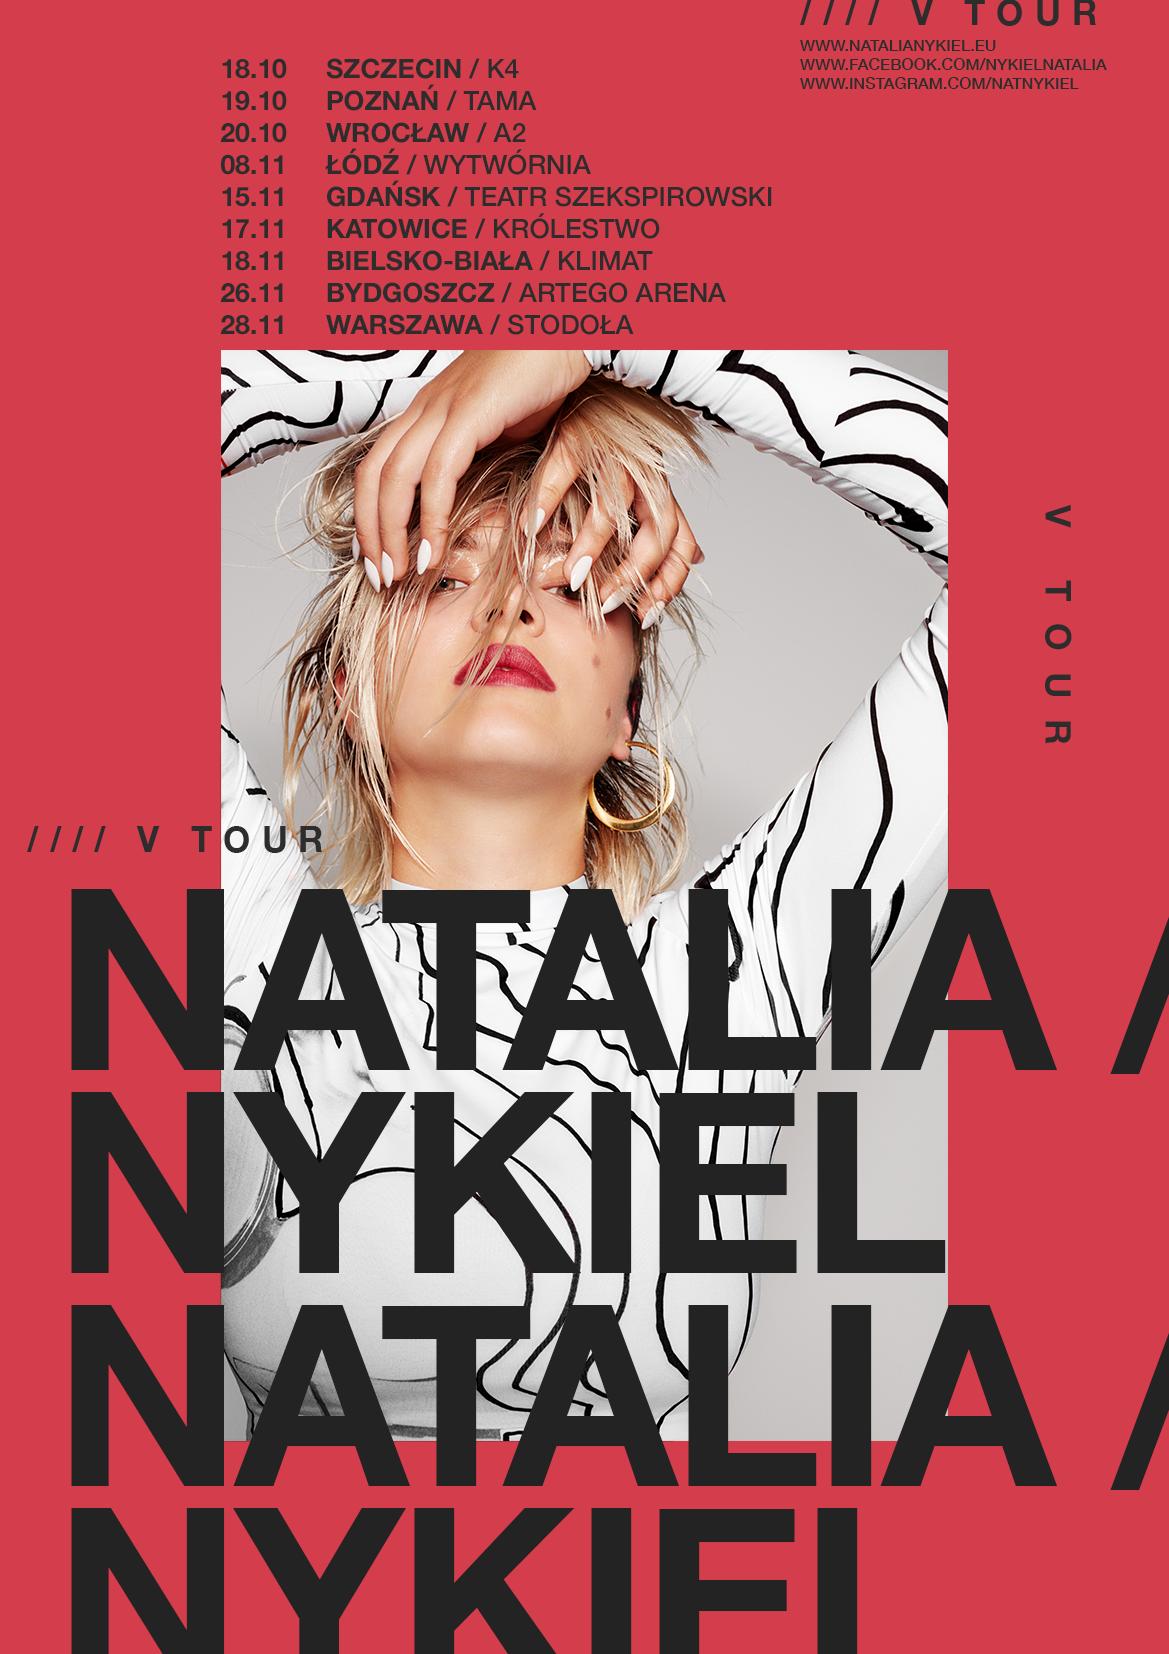 Nykiel_V-Tour_plakat_net_MIASTA.png